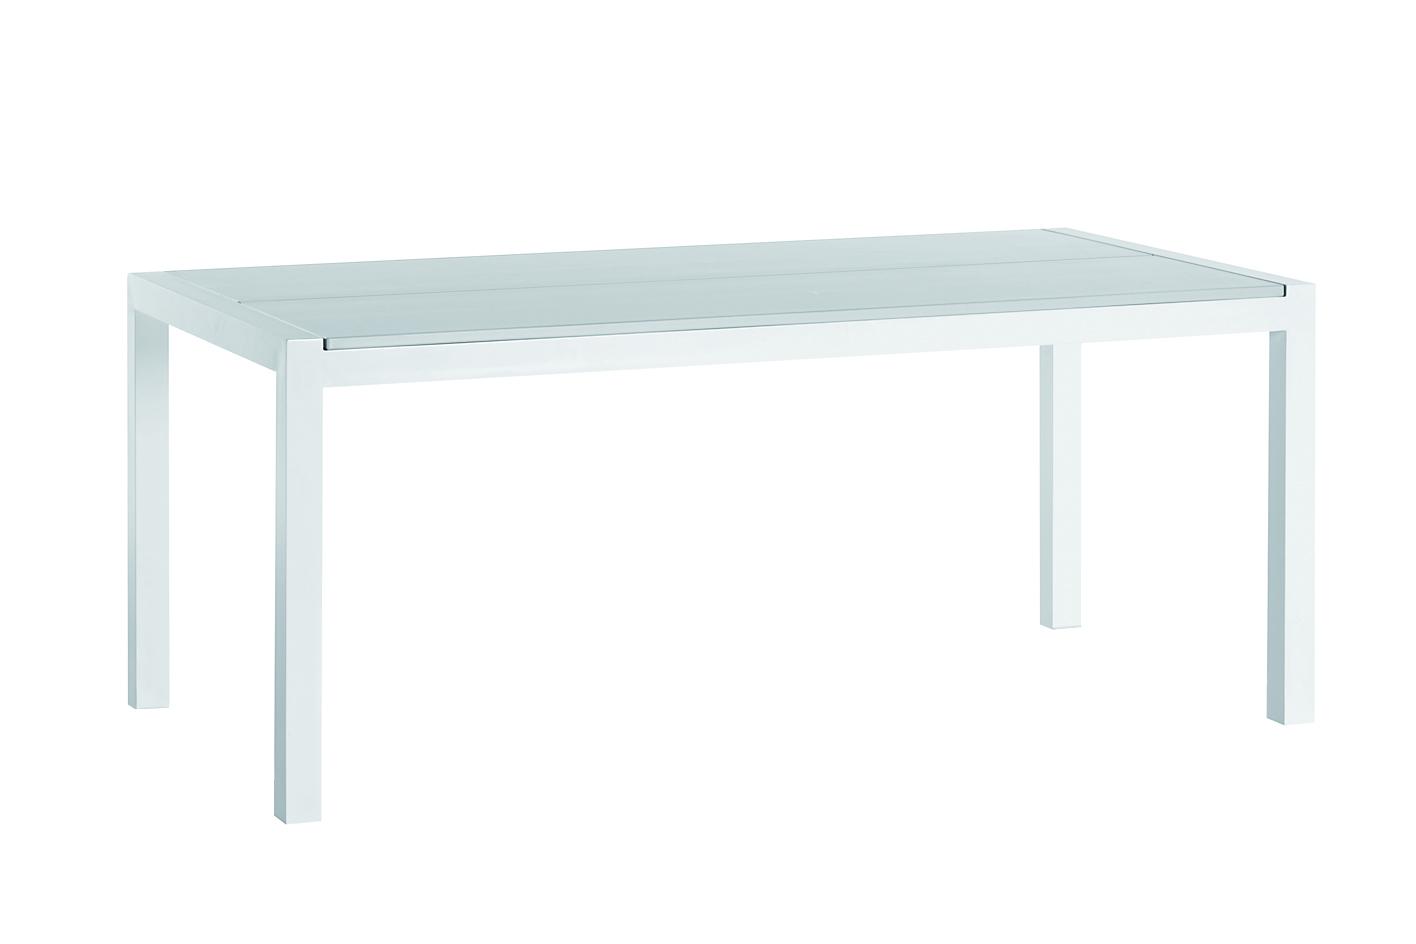 TABLE SALLE À MANGER RECTANGULAIRE